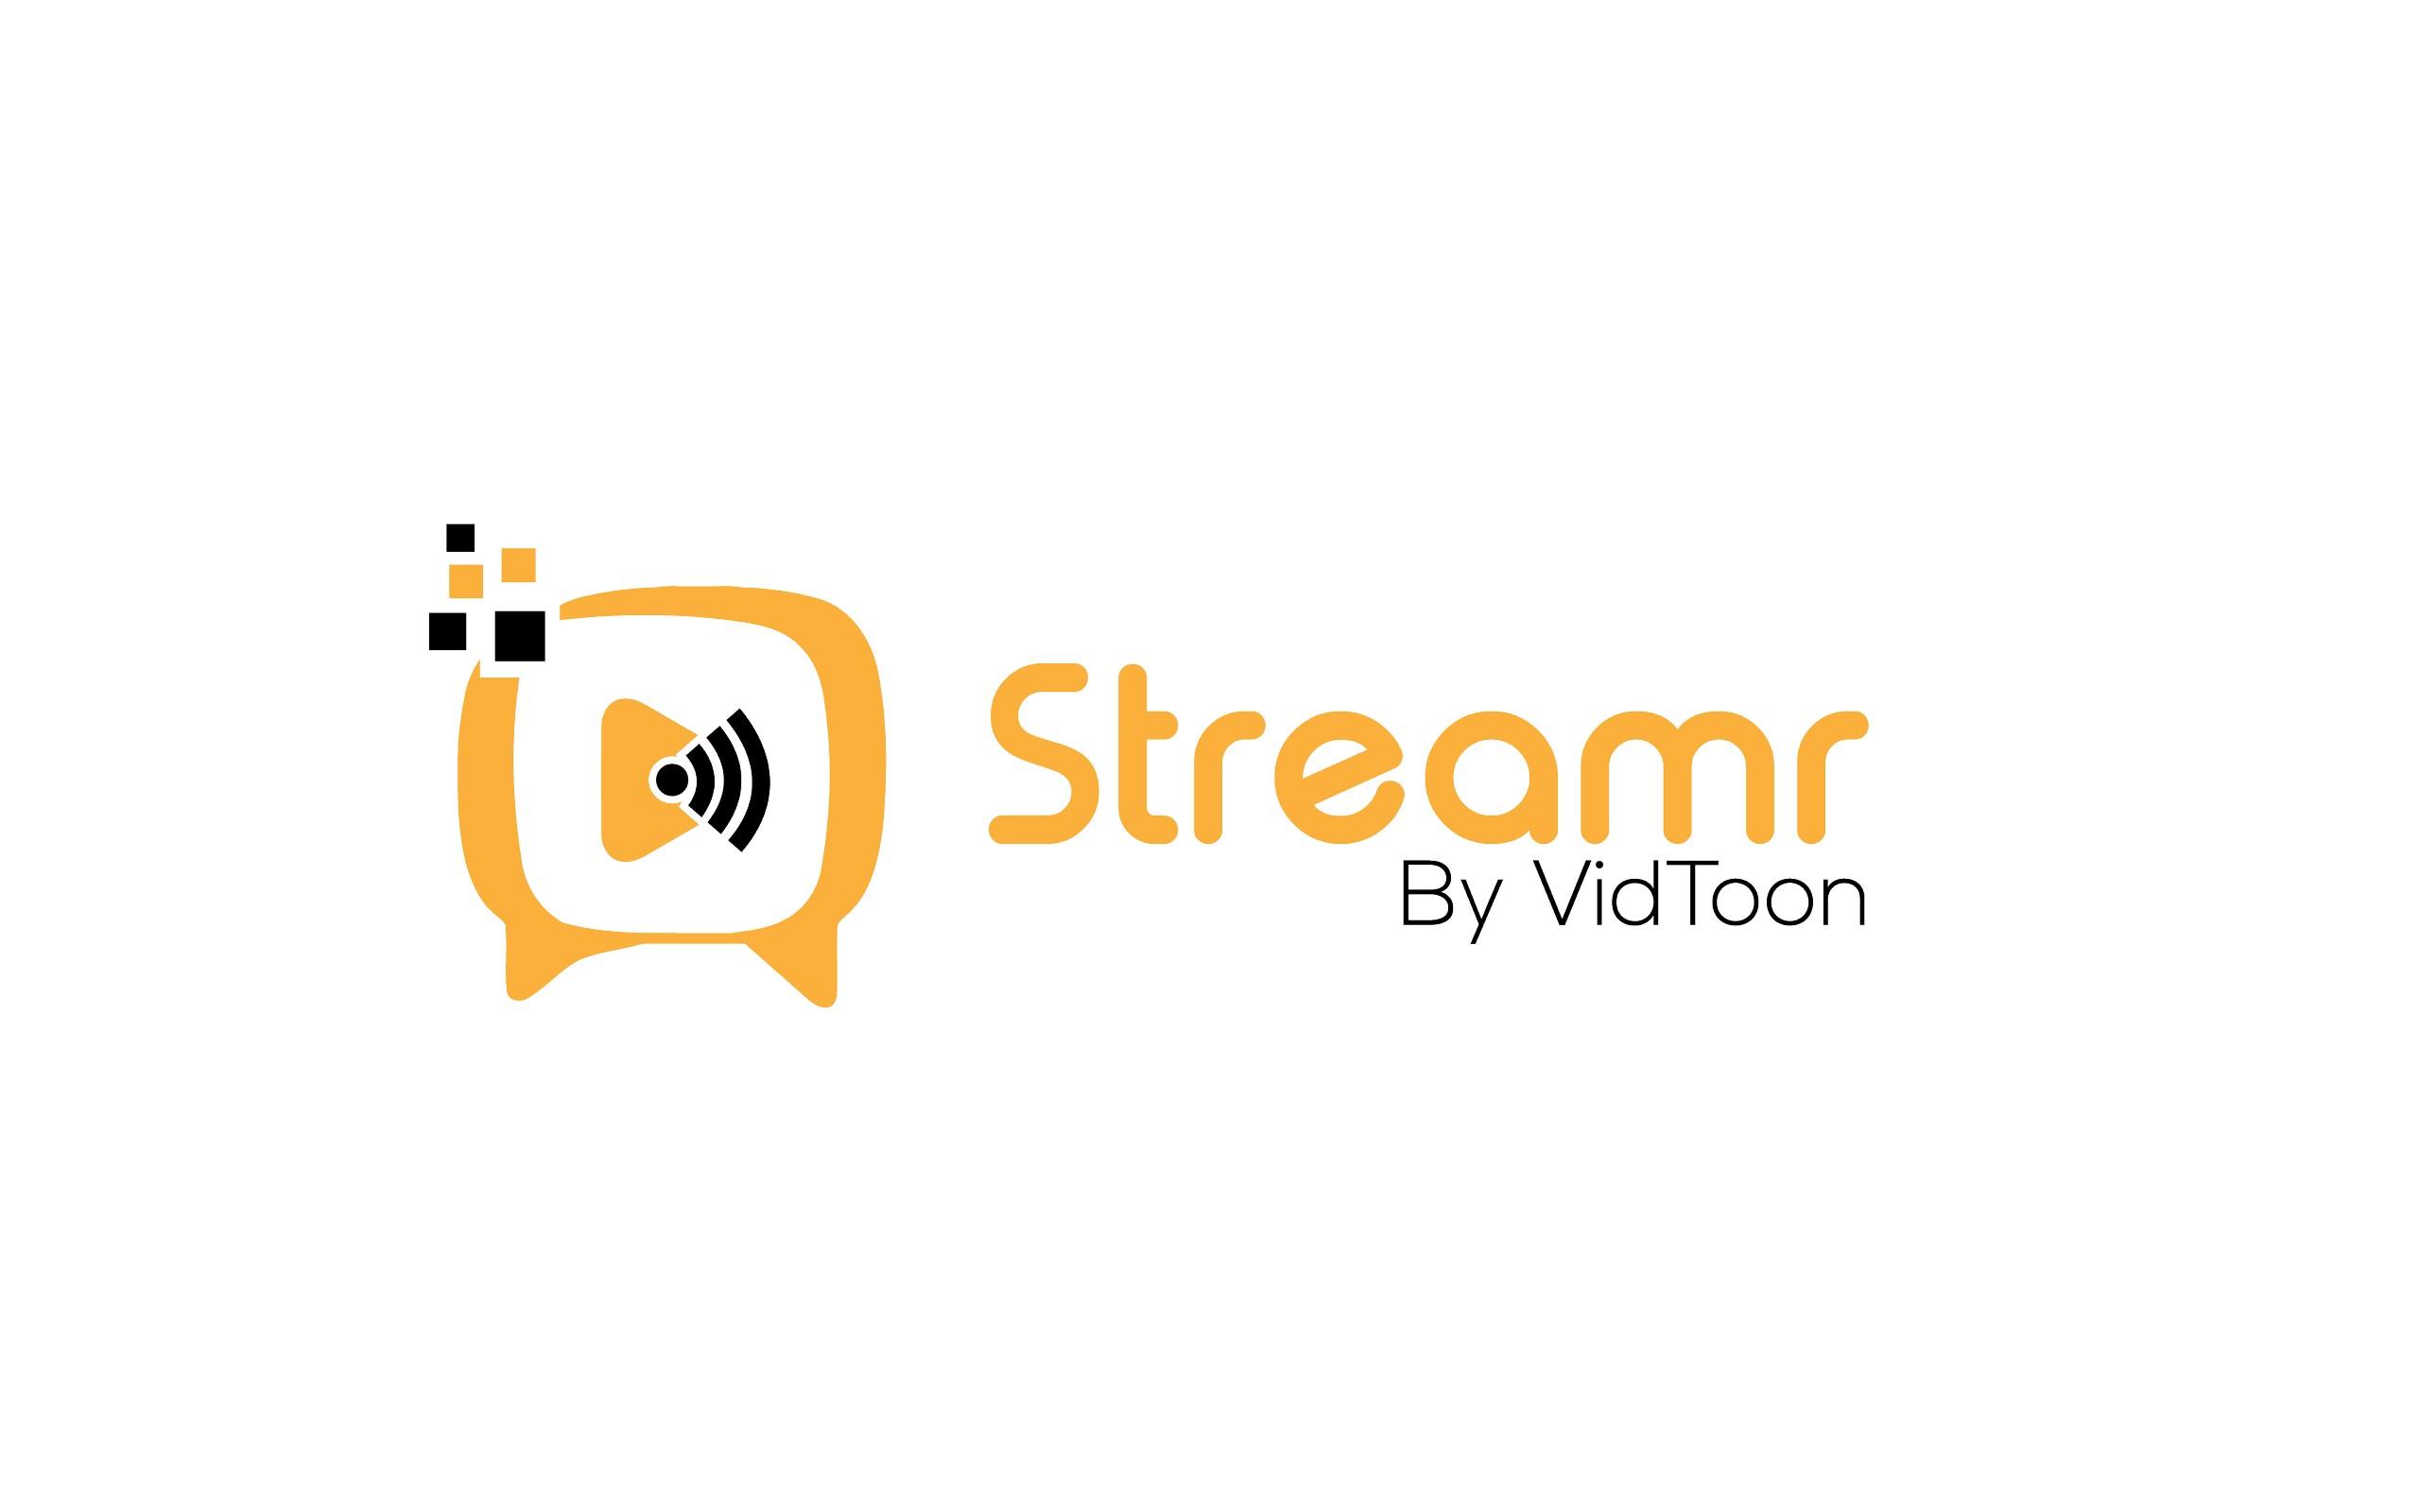 Streamr By Vidtoon™